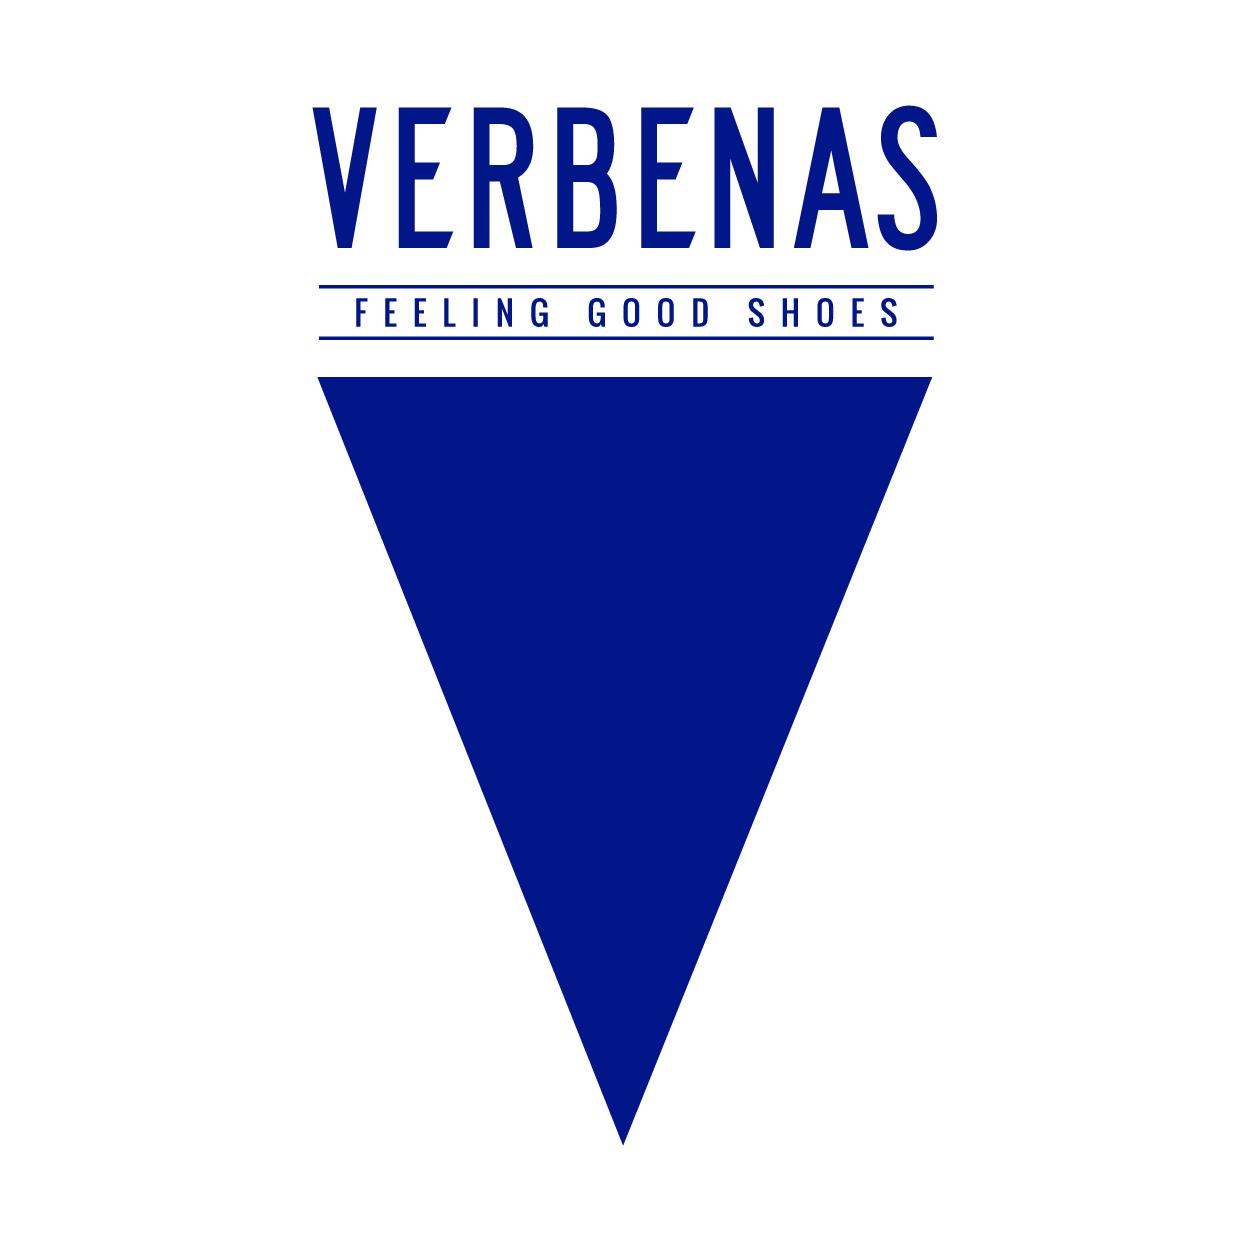 Verbenas-01.jpg